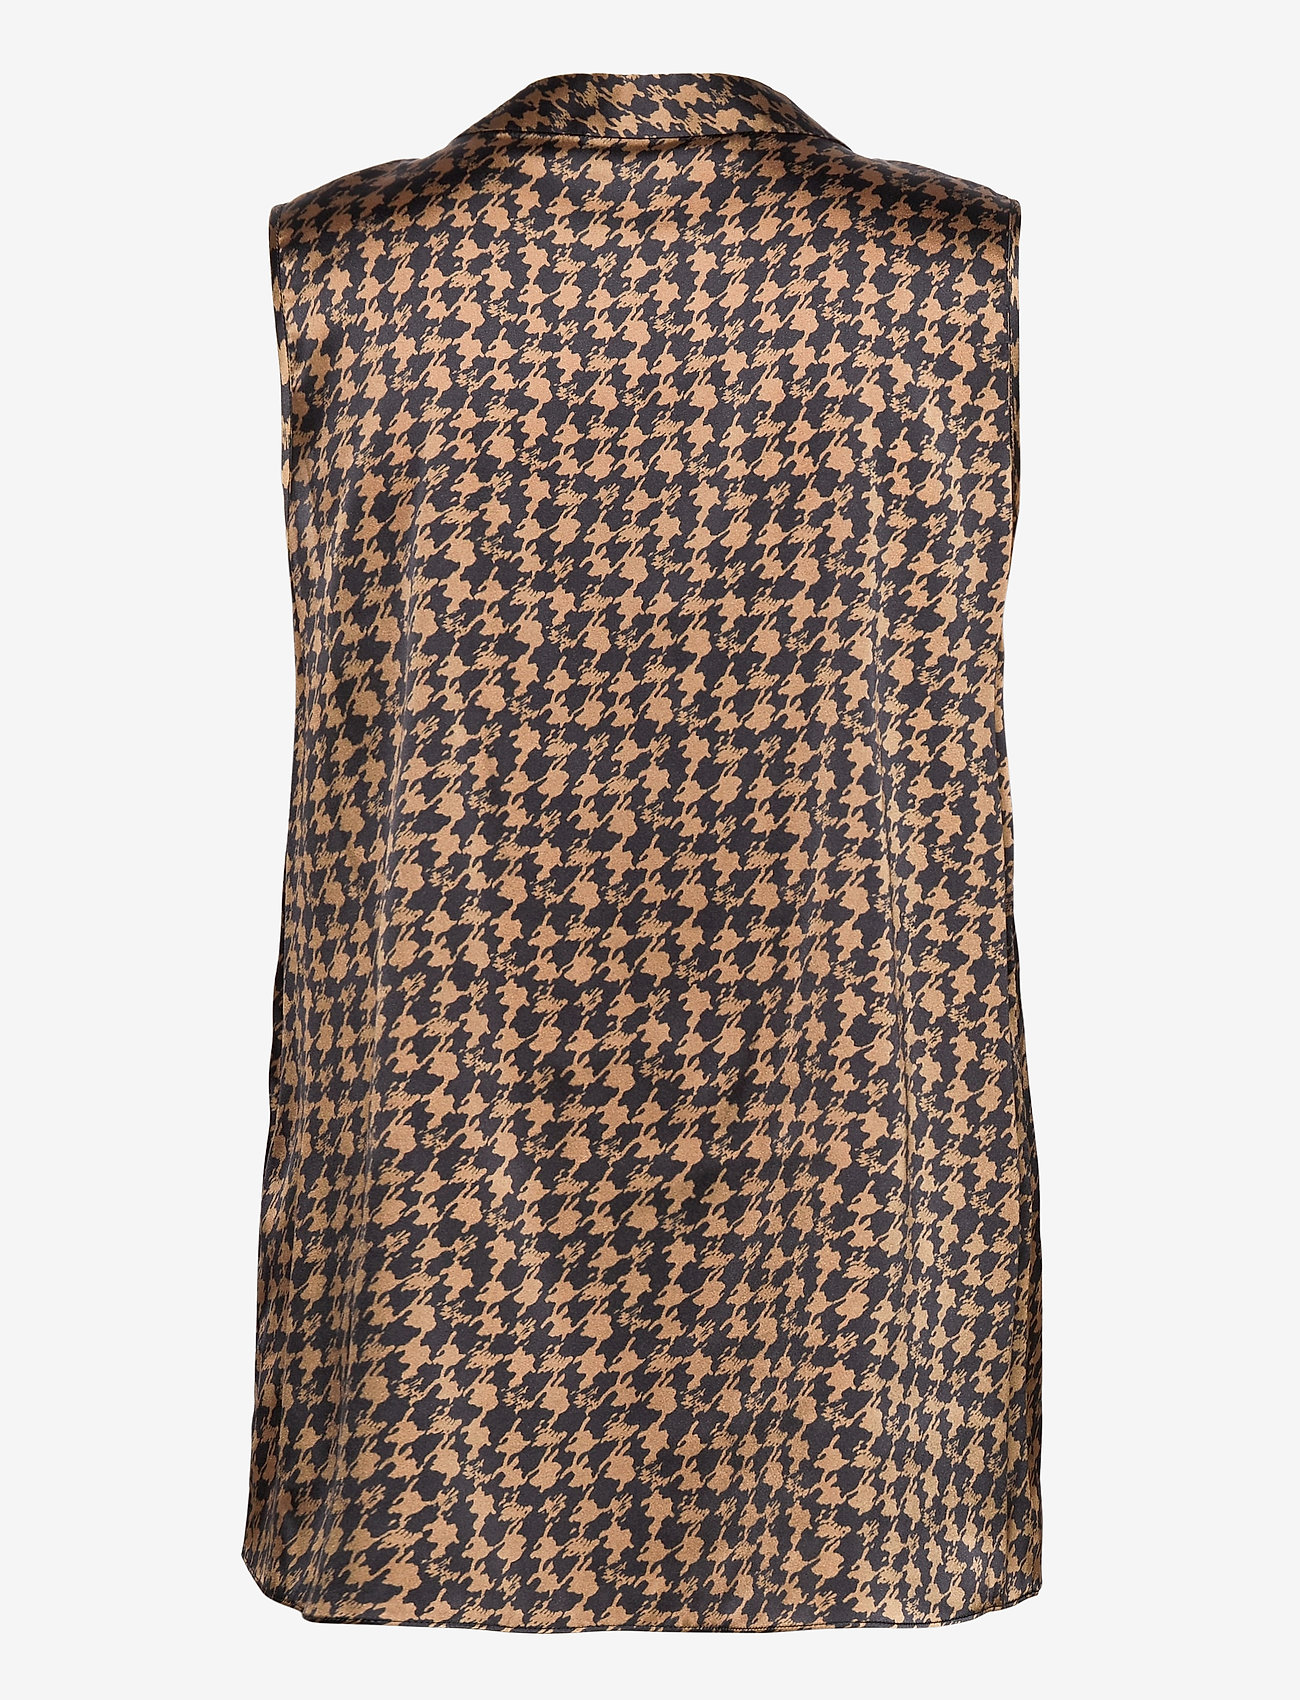 SAND - 3174 Satin - Prosi Top - blouses zonder mouwen - pattern - 1